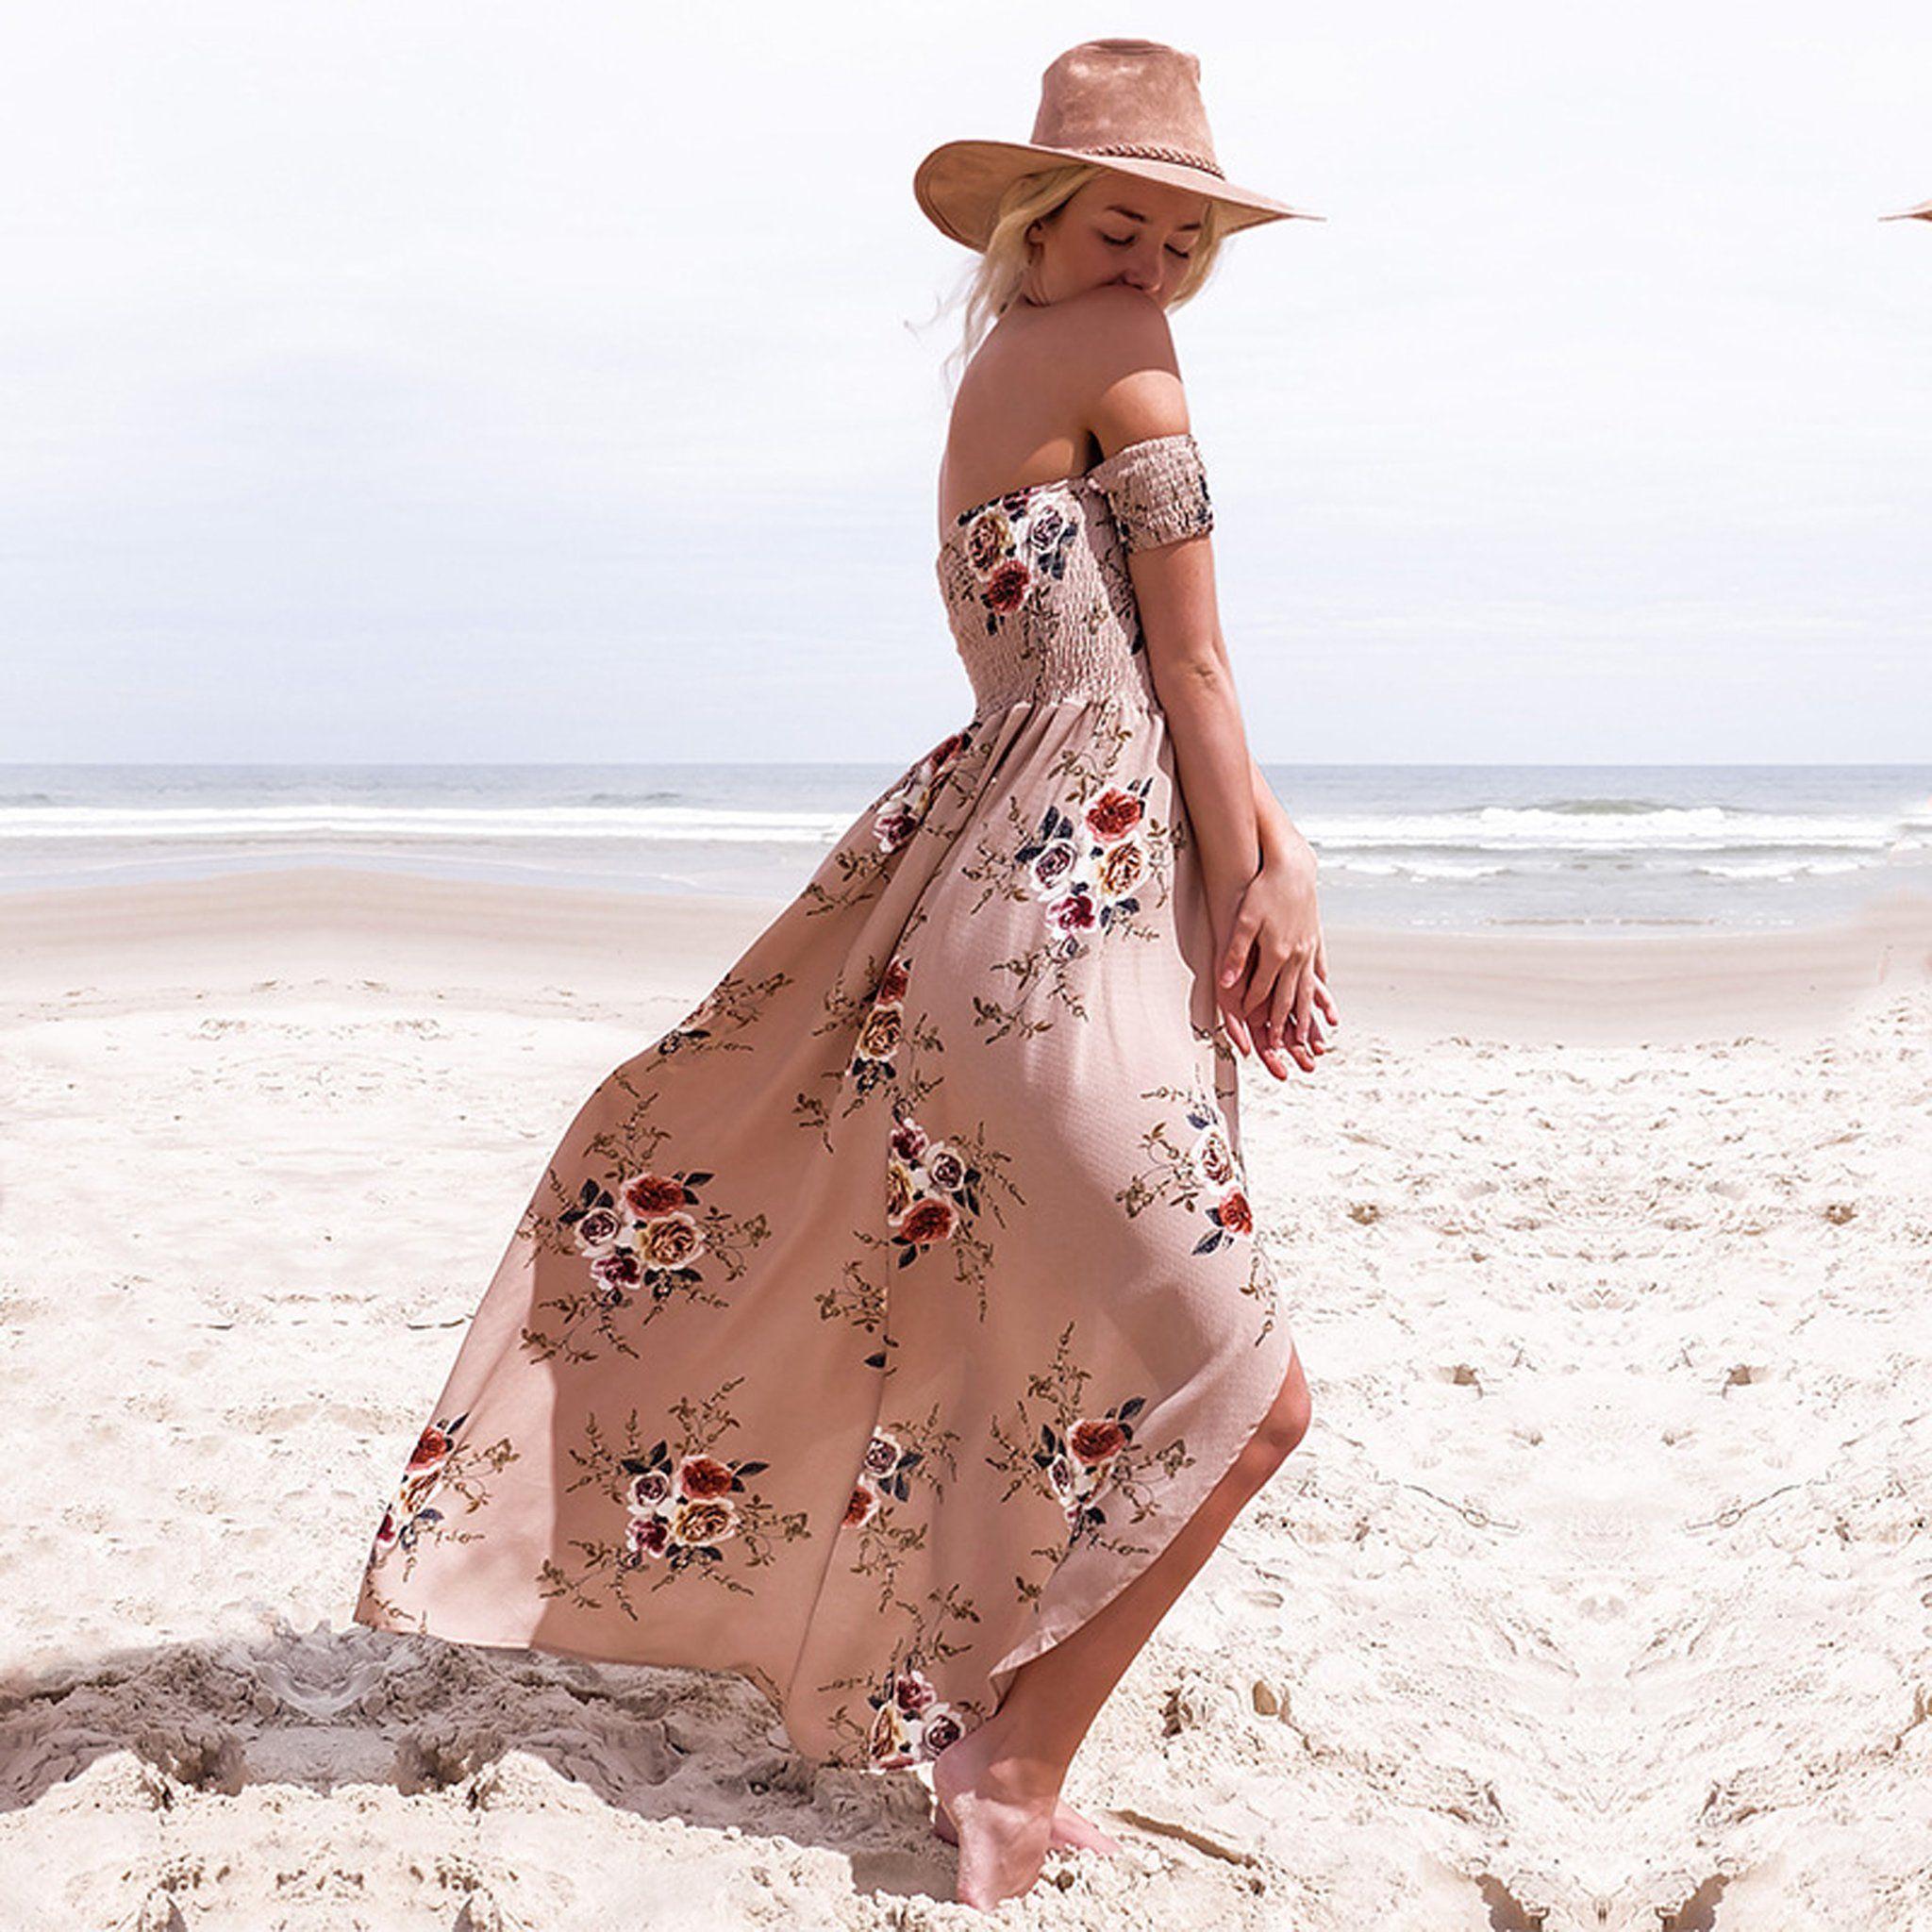 Paisley Boho Vintage Floral Off The Shoulder Drape Maxi Dress Drape Maxi Dress Boho Fashion Summer Beach Shoulder Drape [ 2048 x 2048 Pixel ]